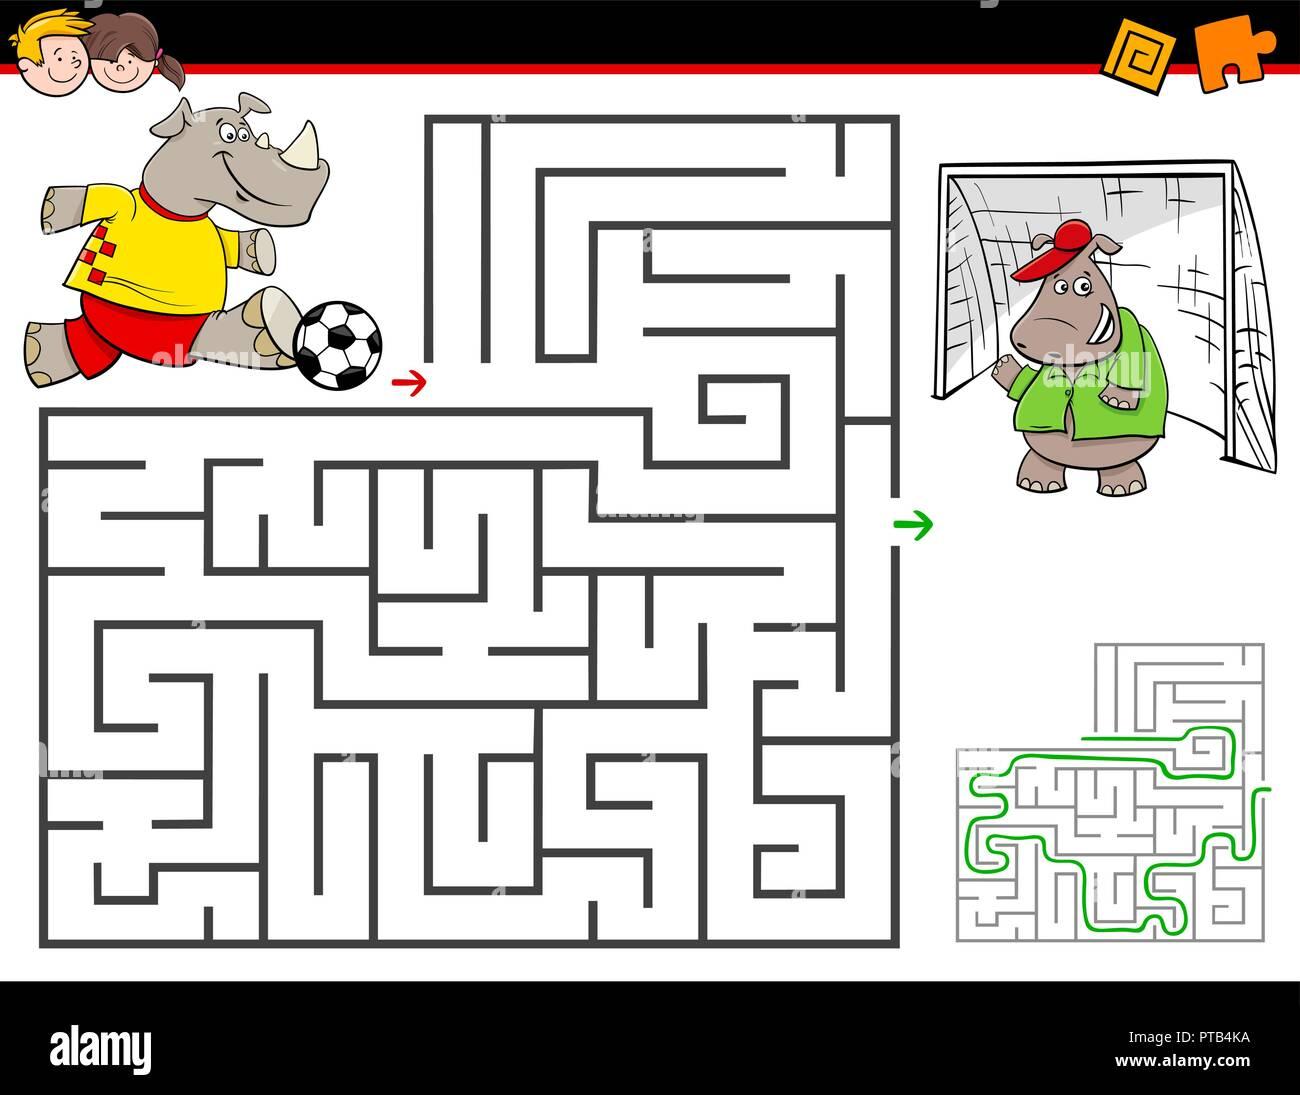 Soccer Worksheet For Preschoolers